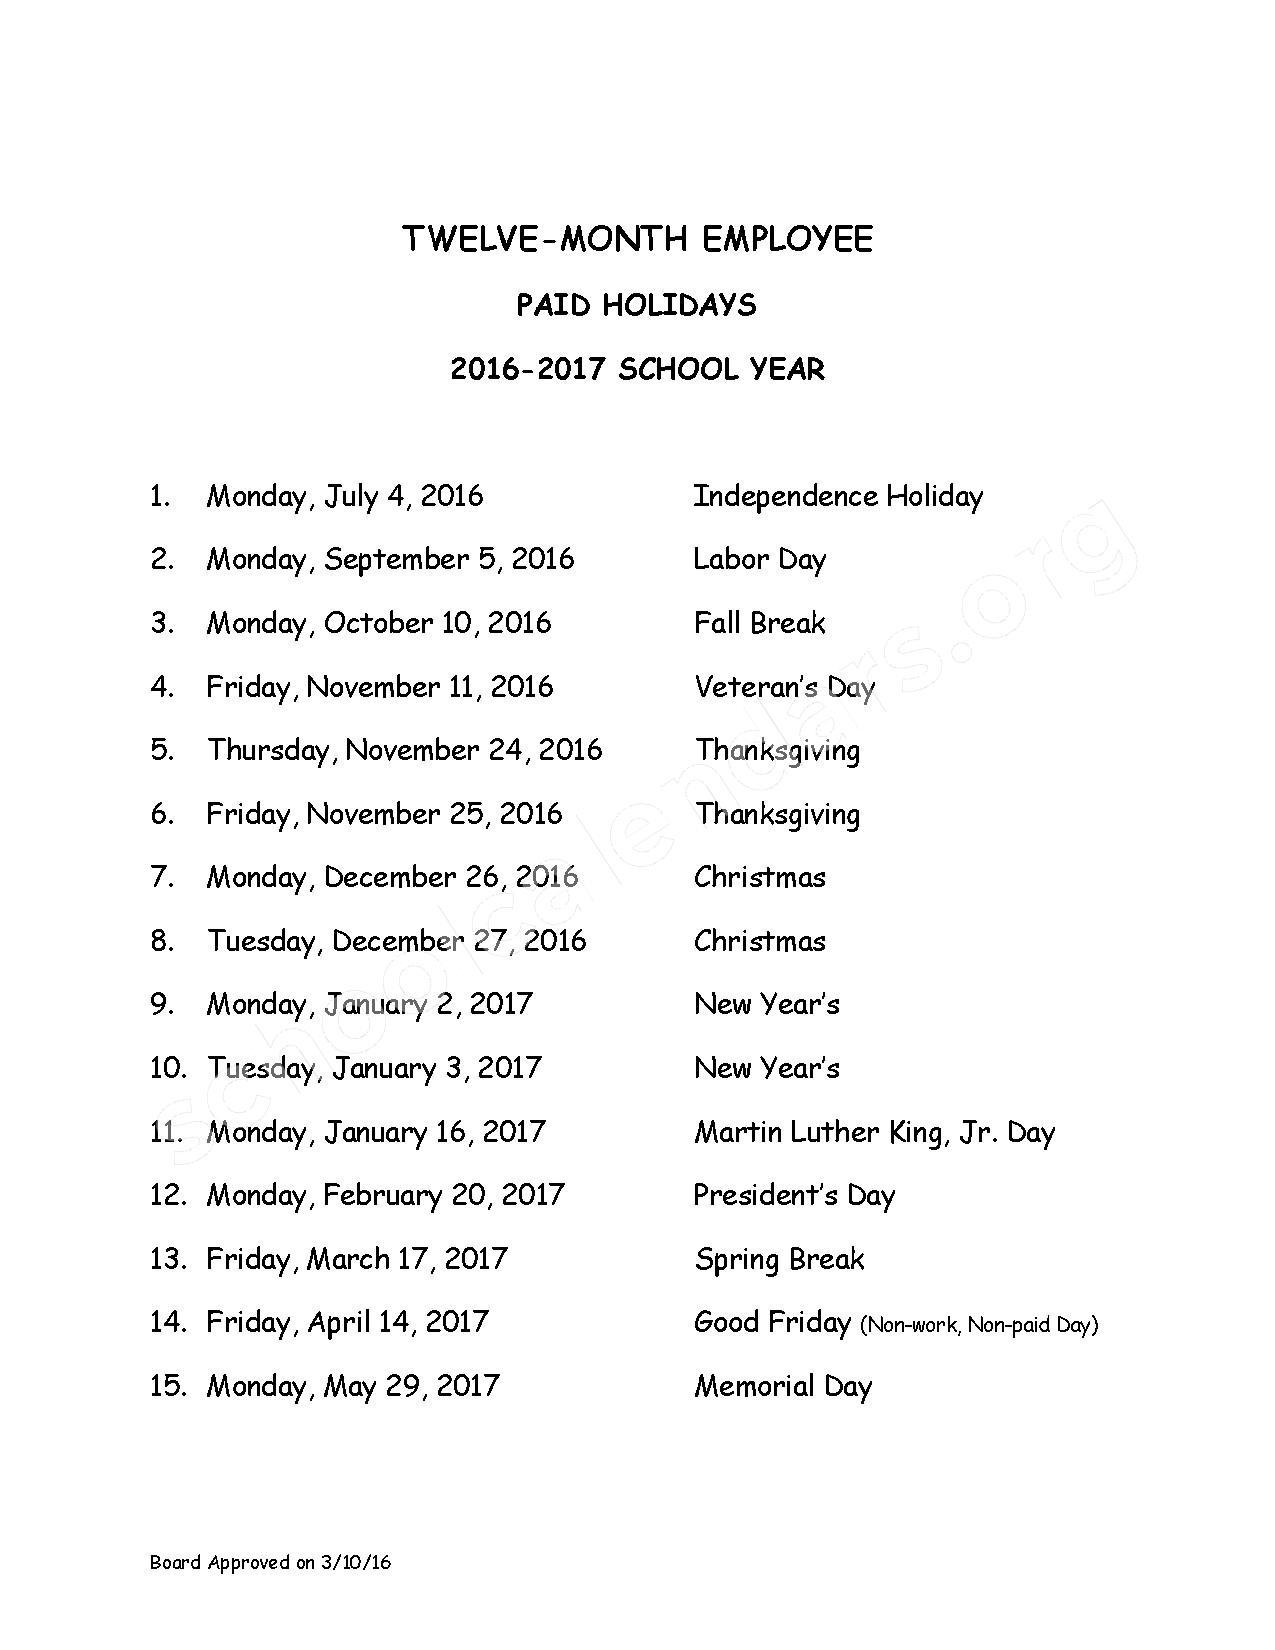 2016 - 2017 District Calendar – Elsa Meyer Elementary School – page 3